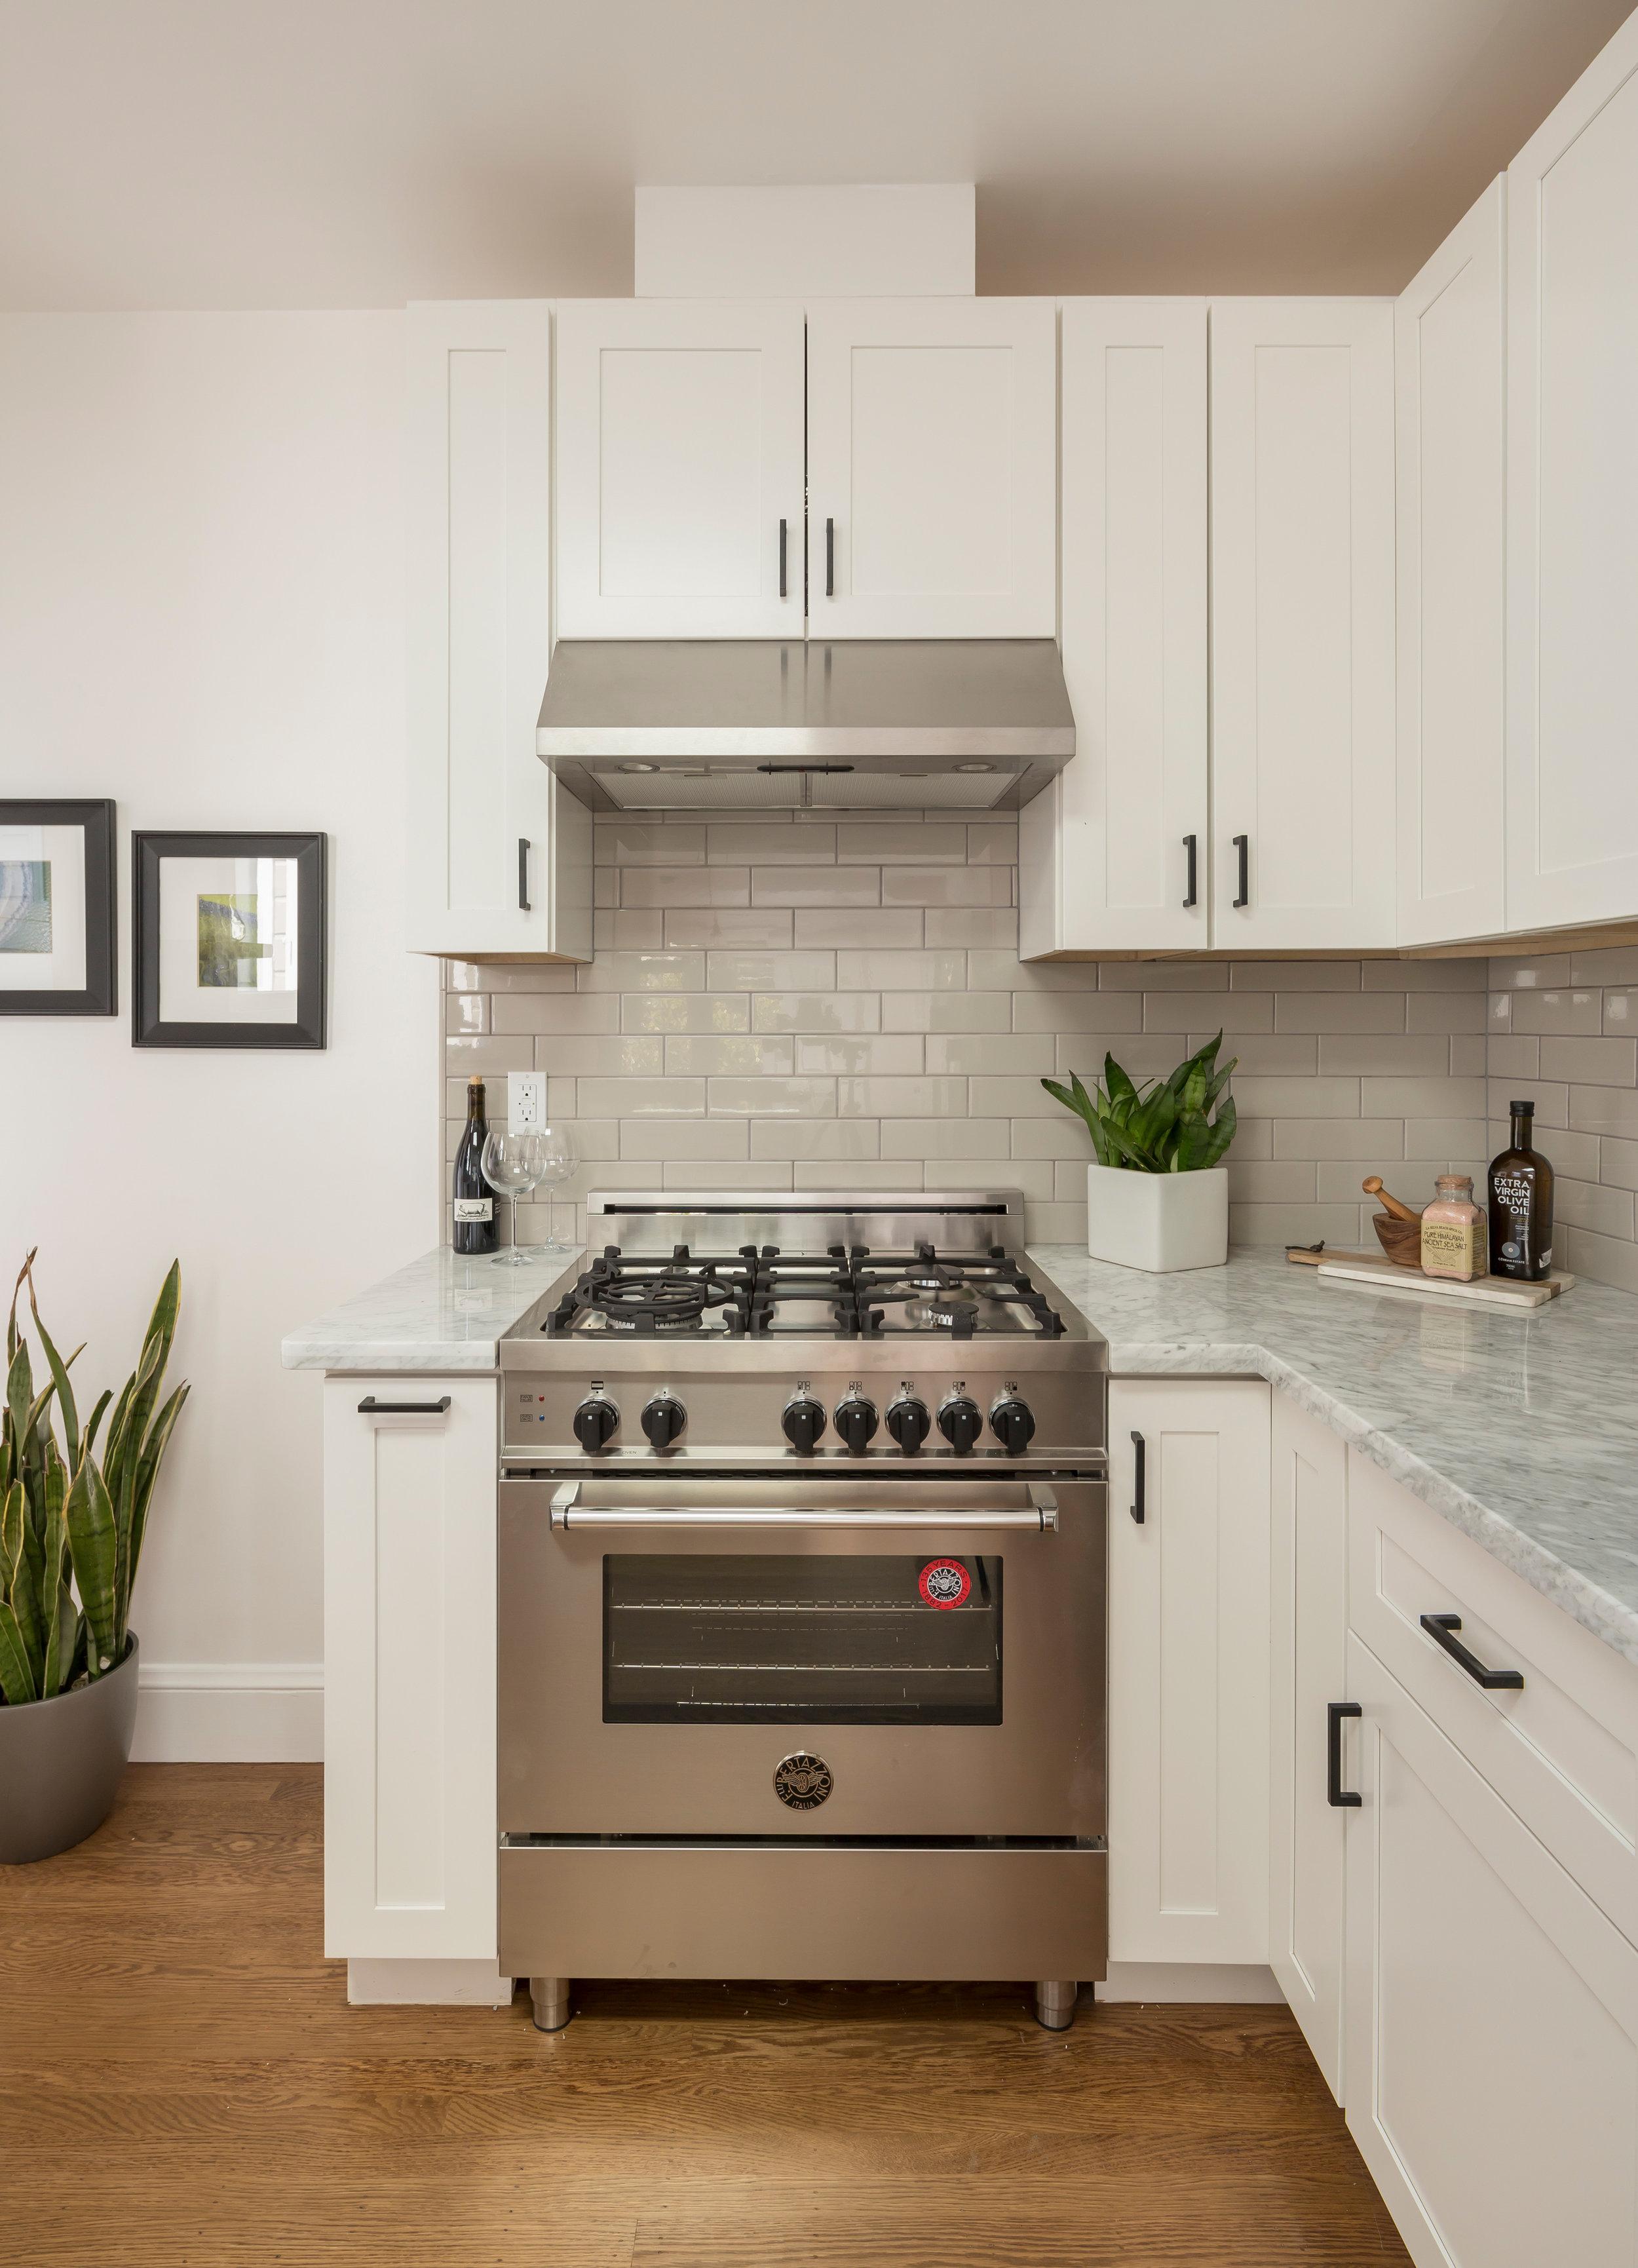 Kitchen_Oven_5723.jpg